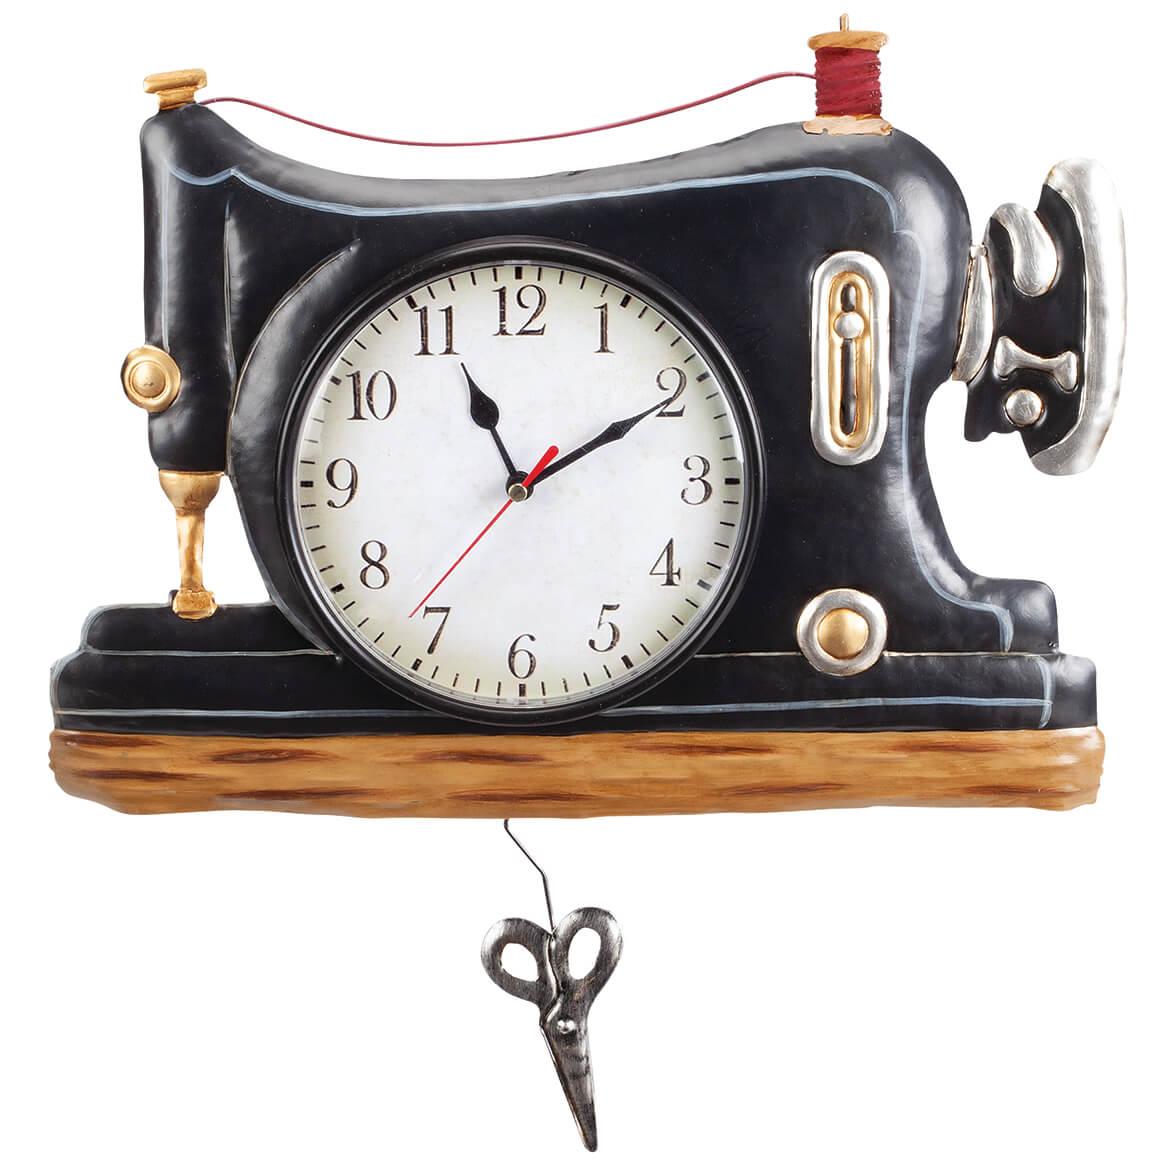 Vintage Pendulum Sewing Clock-370724